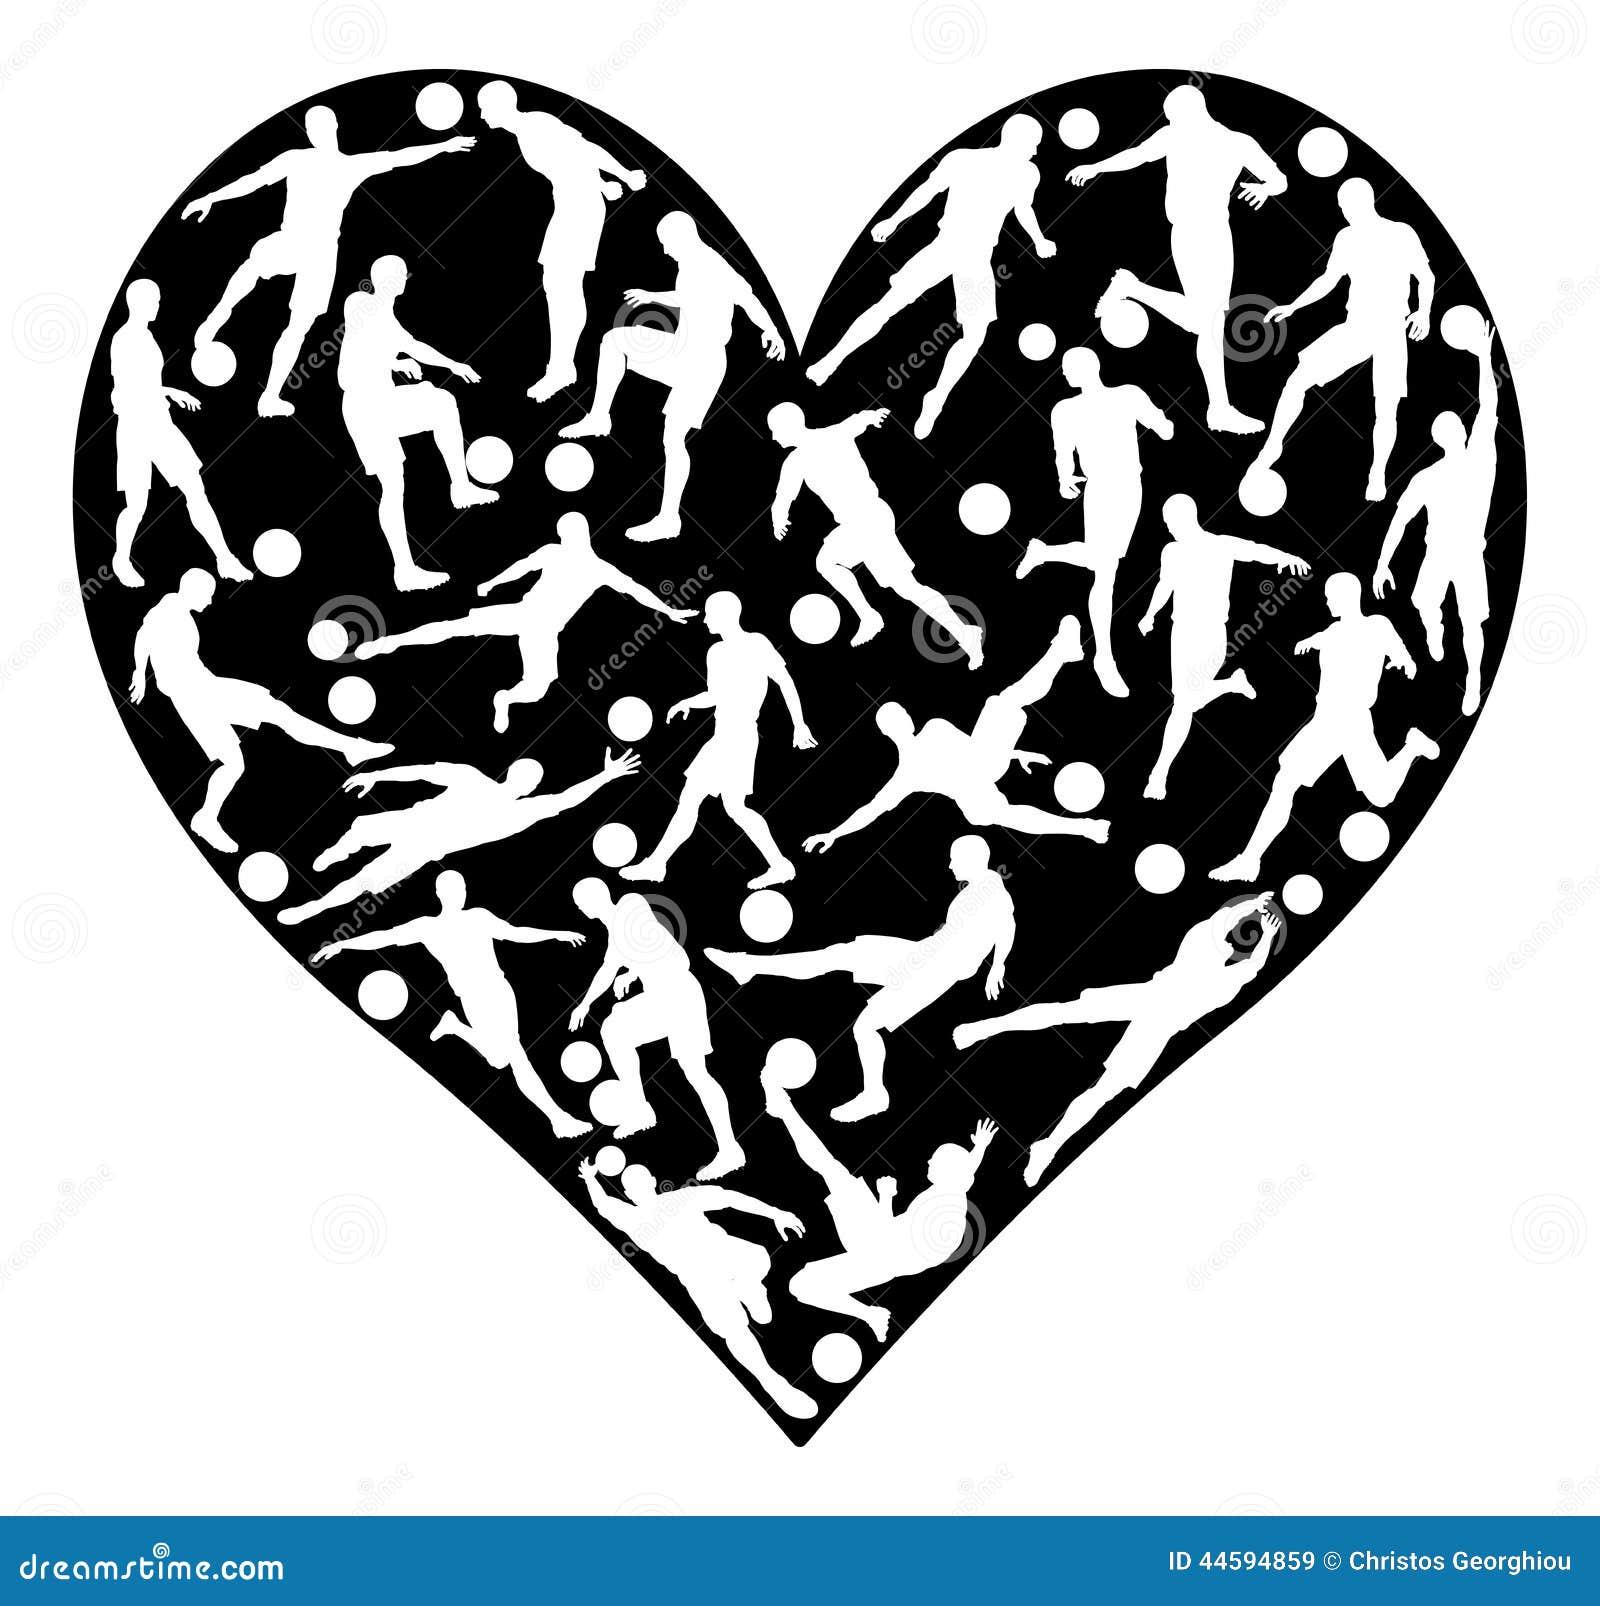 tbol heart